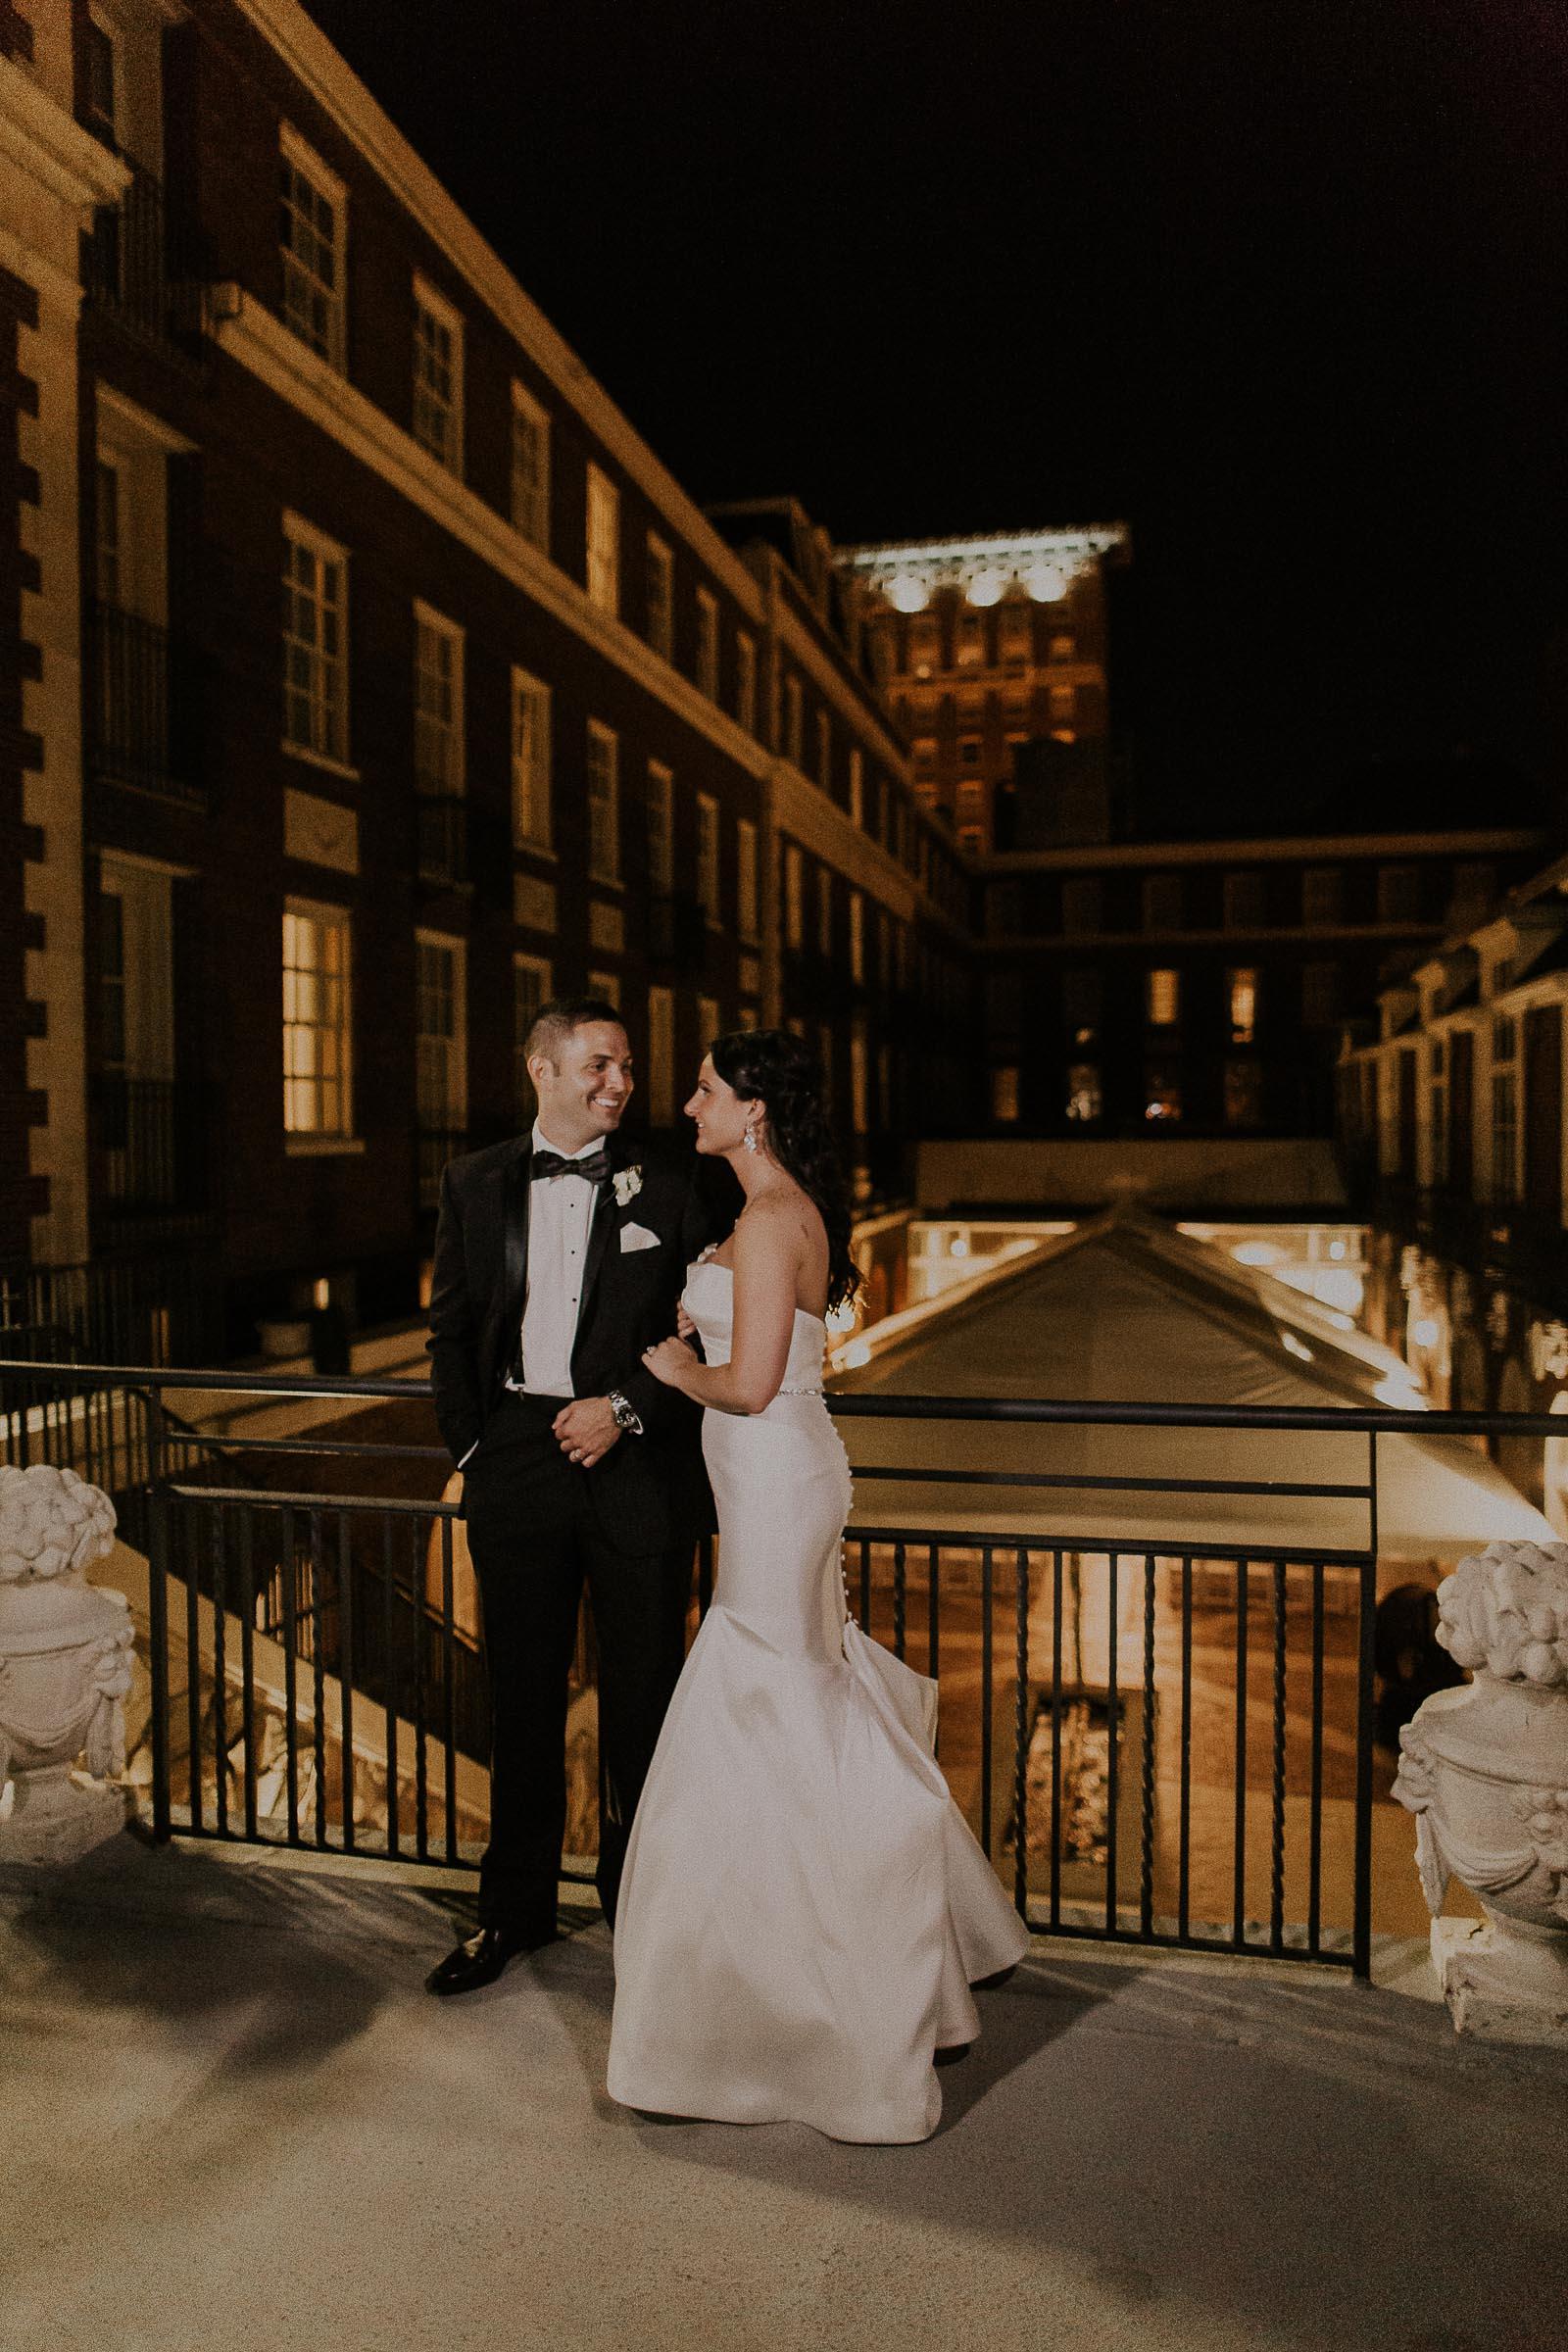 Tom + Robin  Art Deco Inspired Wedding at Magnolia Hotel in Omaha, Nebraska     view